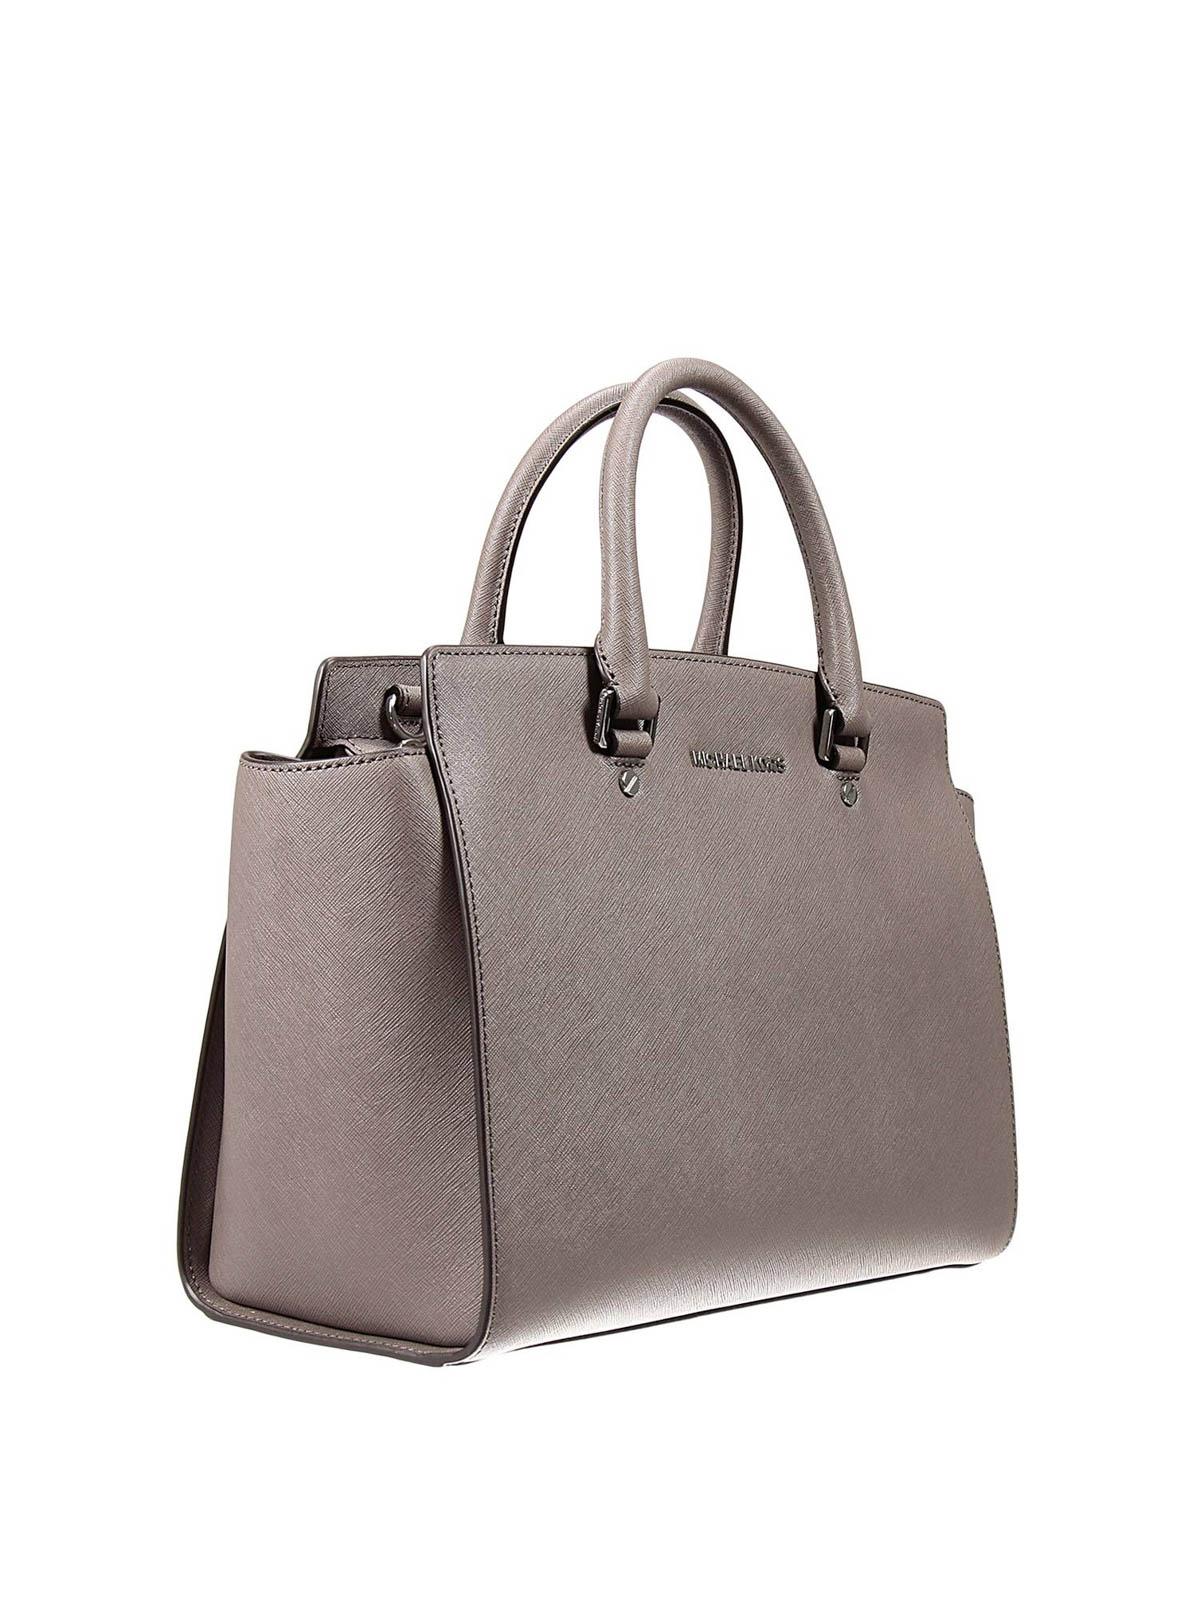 Michael Kors Selma Shopper LG Handtaschen 30T3SLMS7L